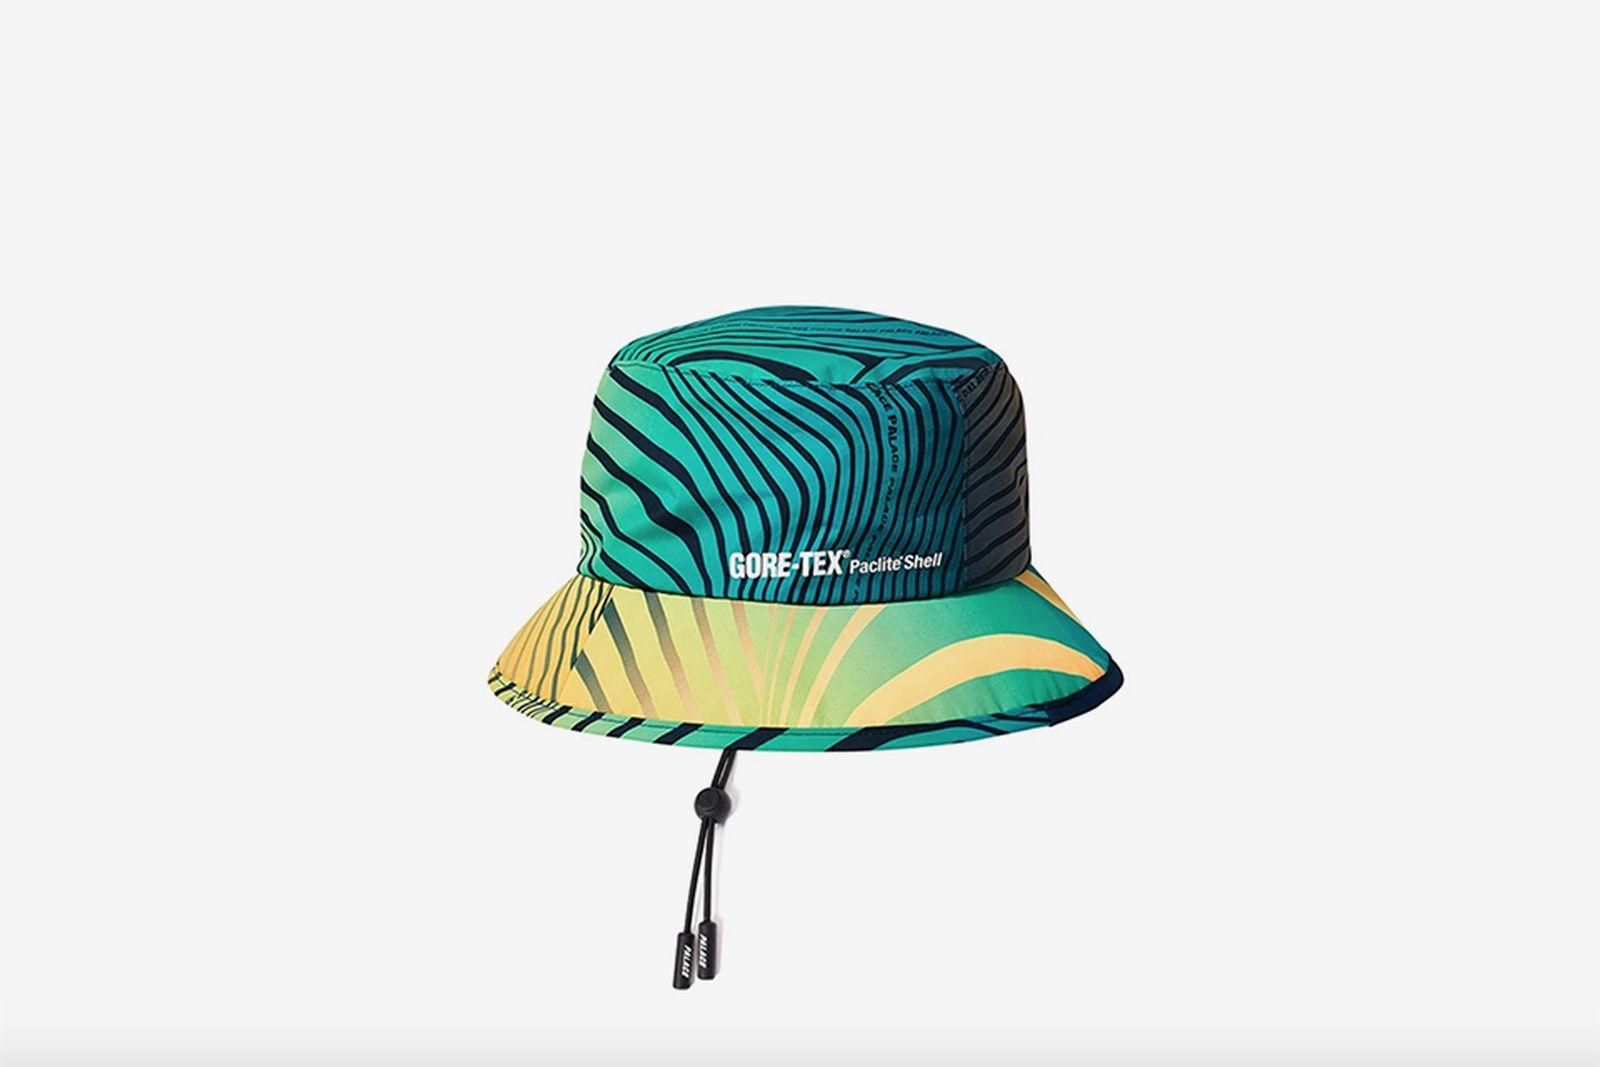 palace gore tex jackets hats gore-tex